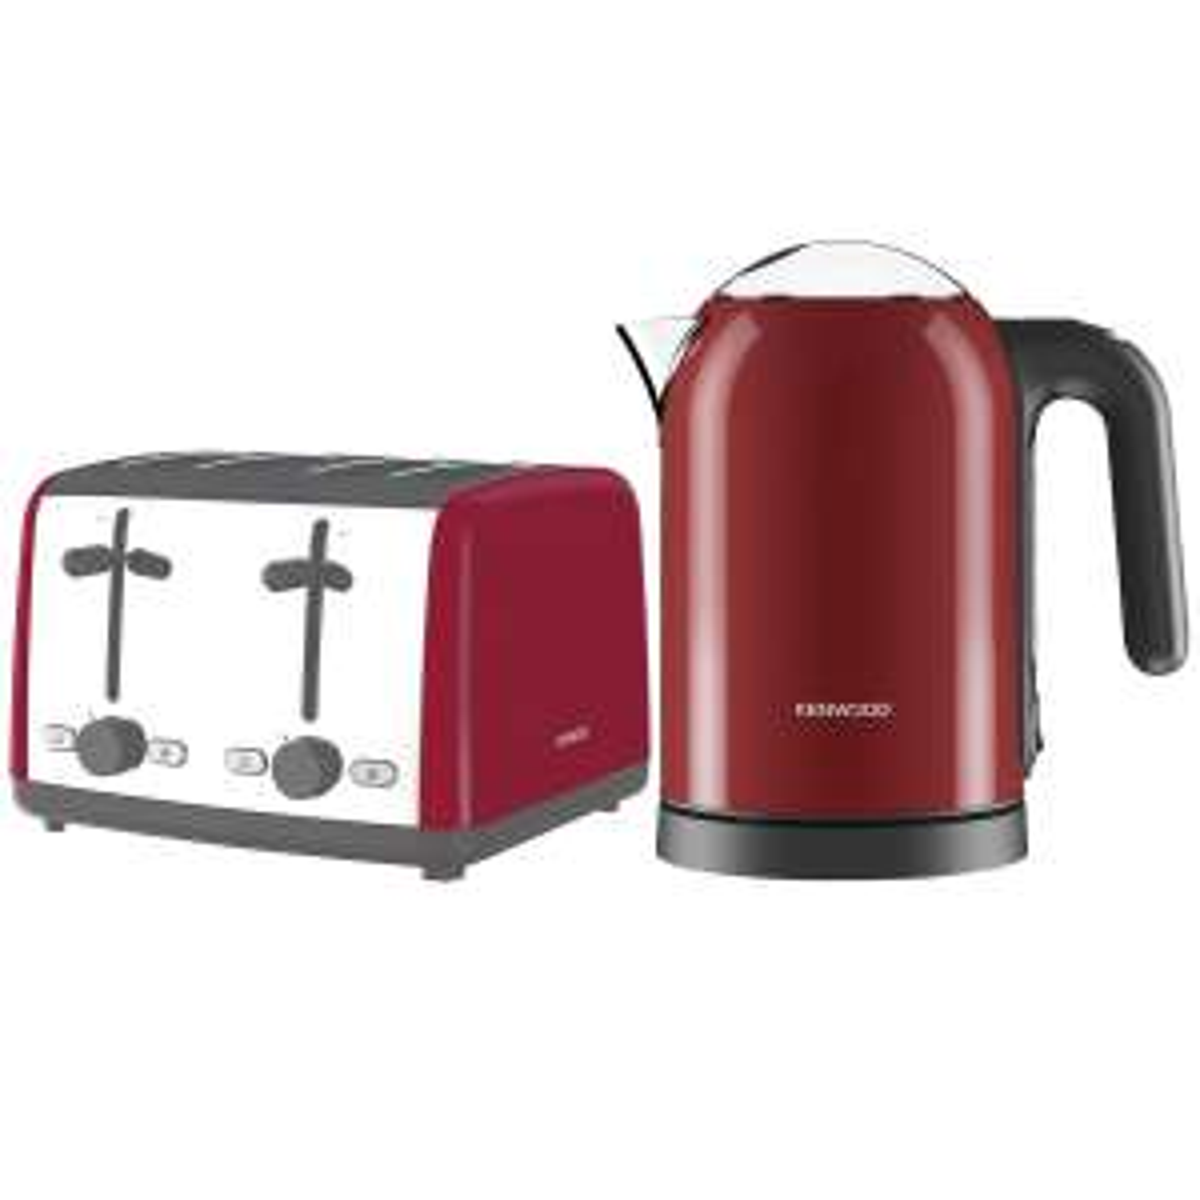 Kenwood Scene 3KW Electric Kettle 1.6L & 4 Slice Toaster 1800W Bundle Red - £37.50 @ Tesco Outlet Ebay